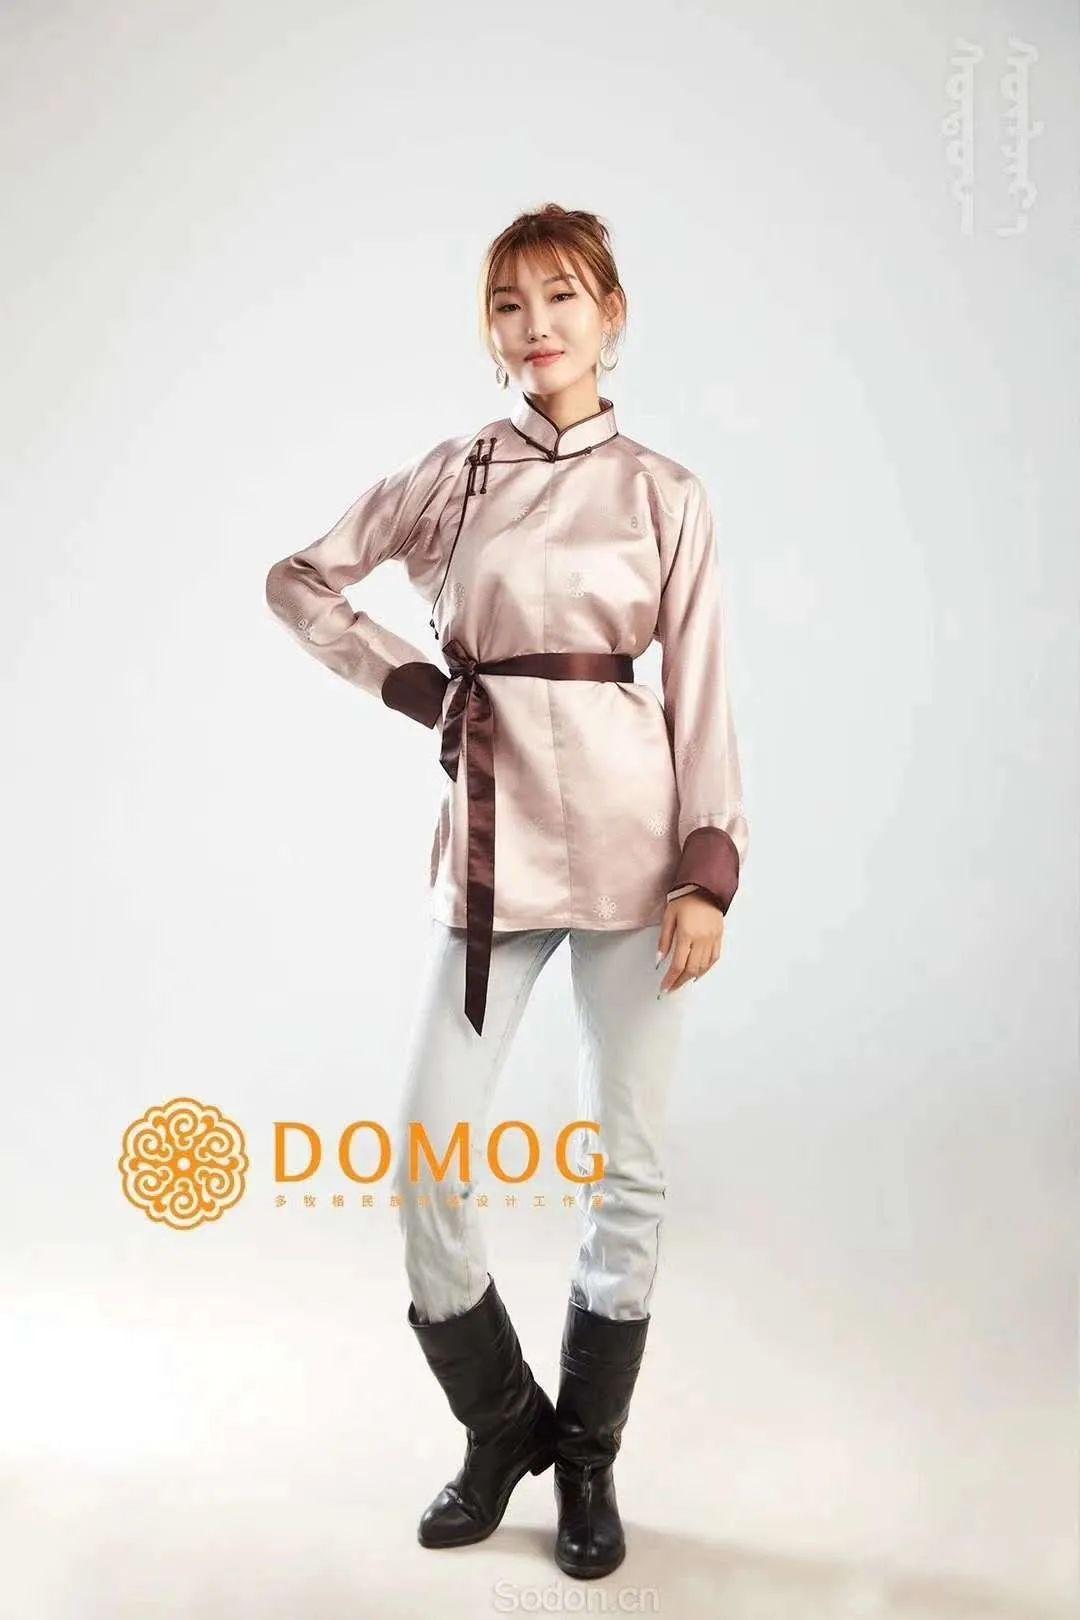 DOMOG 蒙古时装2020新款,民族与时尚的融合 第38张 DOMOG 蒙古时装2020新款,民族与时尚的融合 蒙古服饰